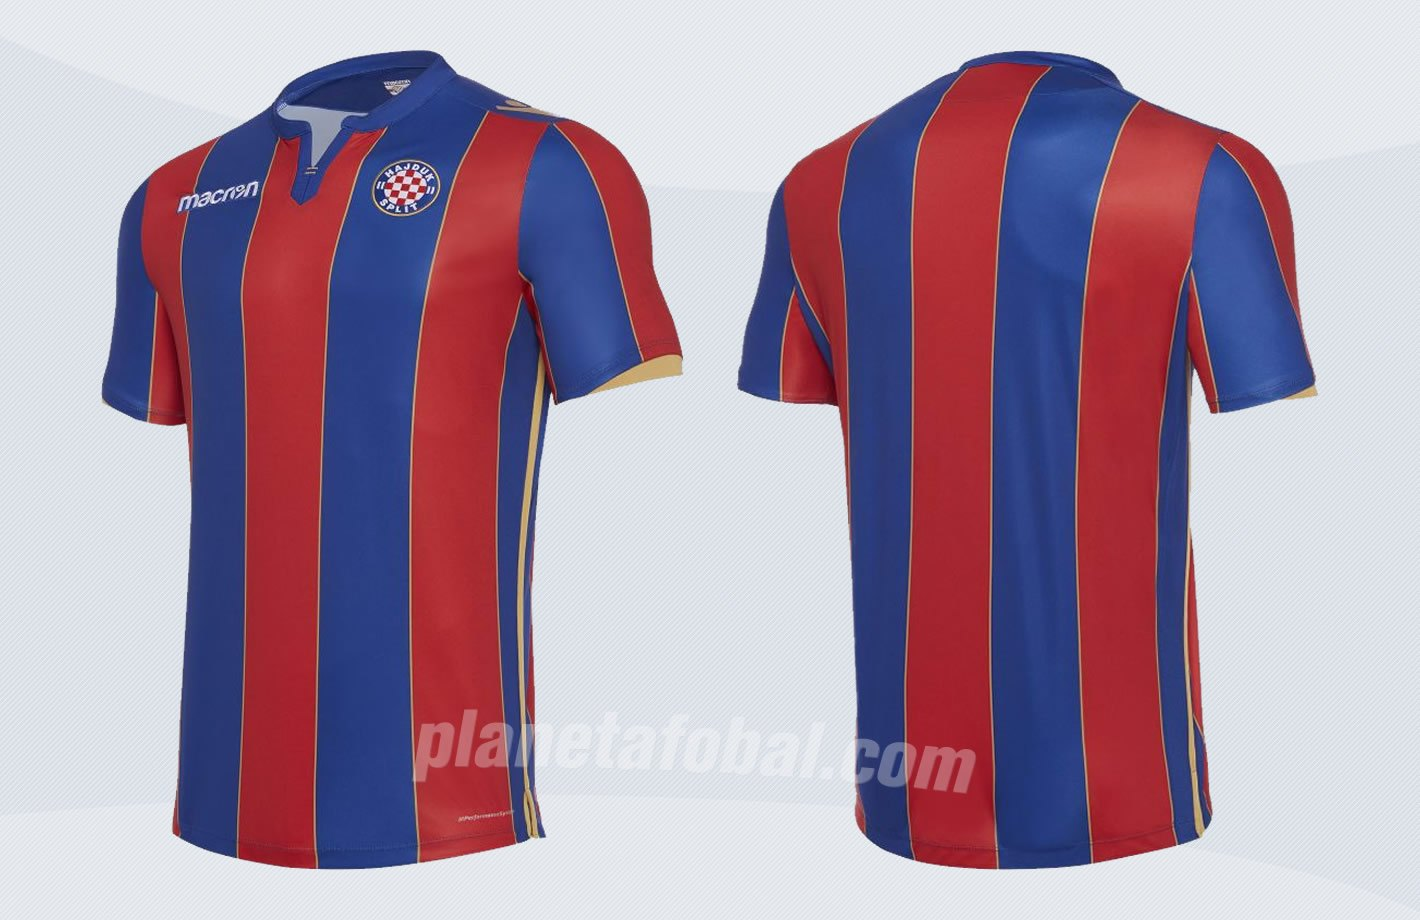 Camiseta suplente del Hajduk Split 2017-18 | Imágenes Web Oficial